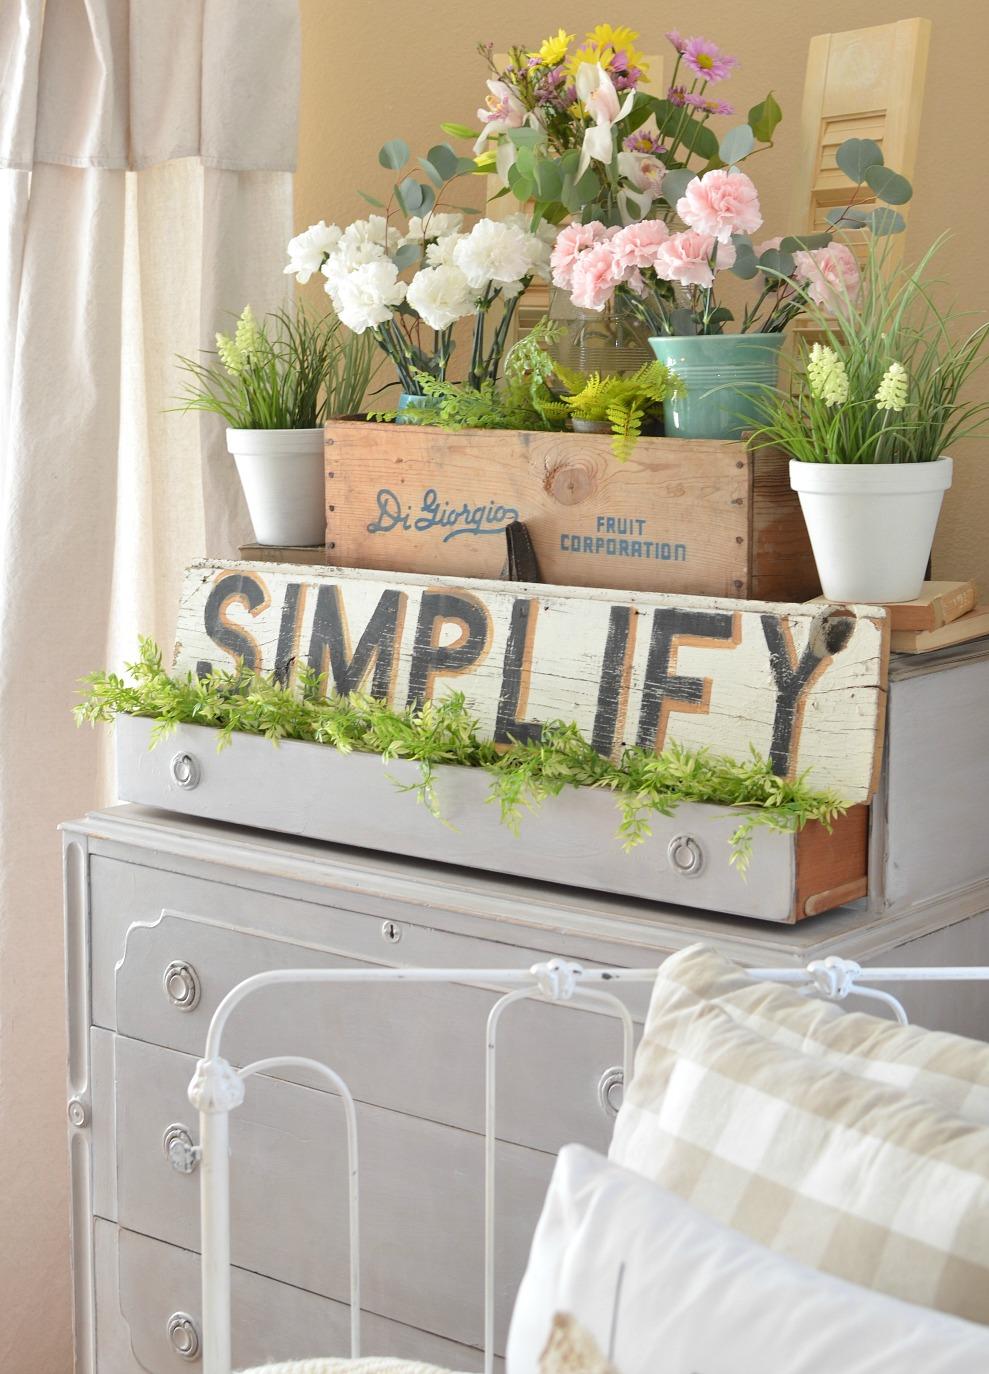 A Vintage Dresser and a Pretty Spring Vignette